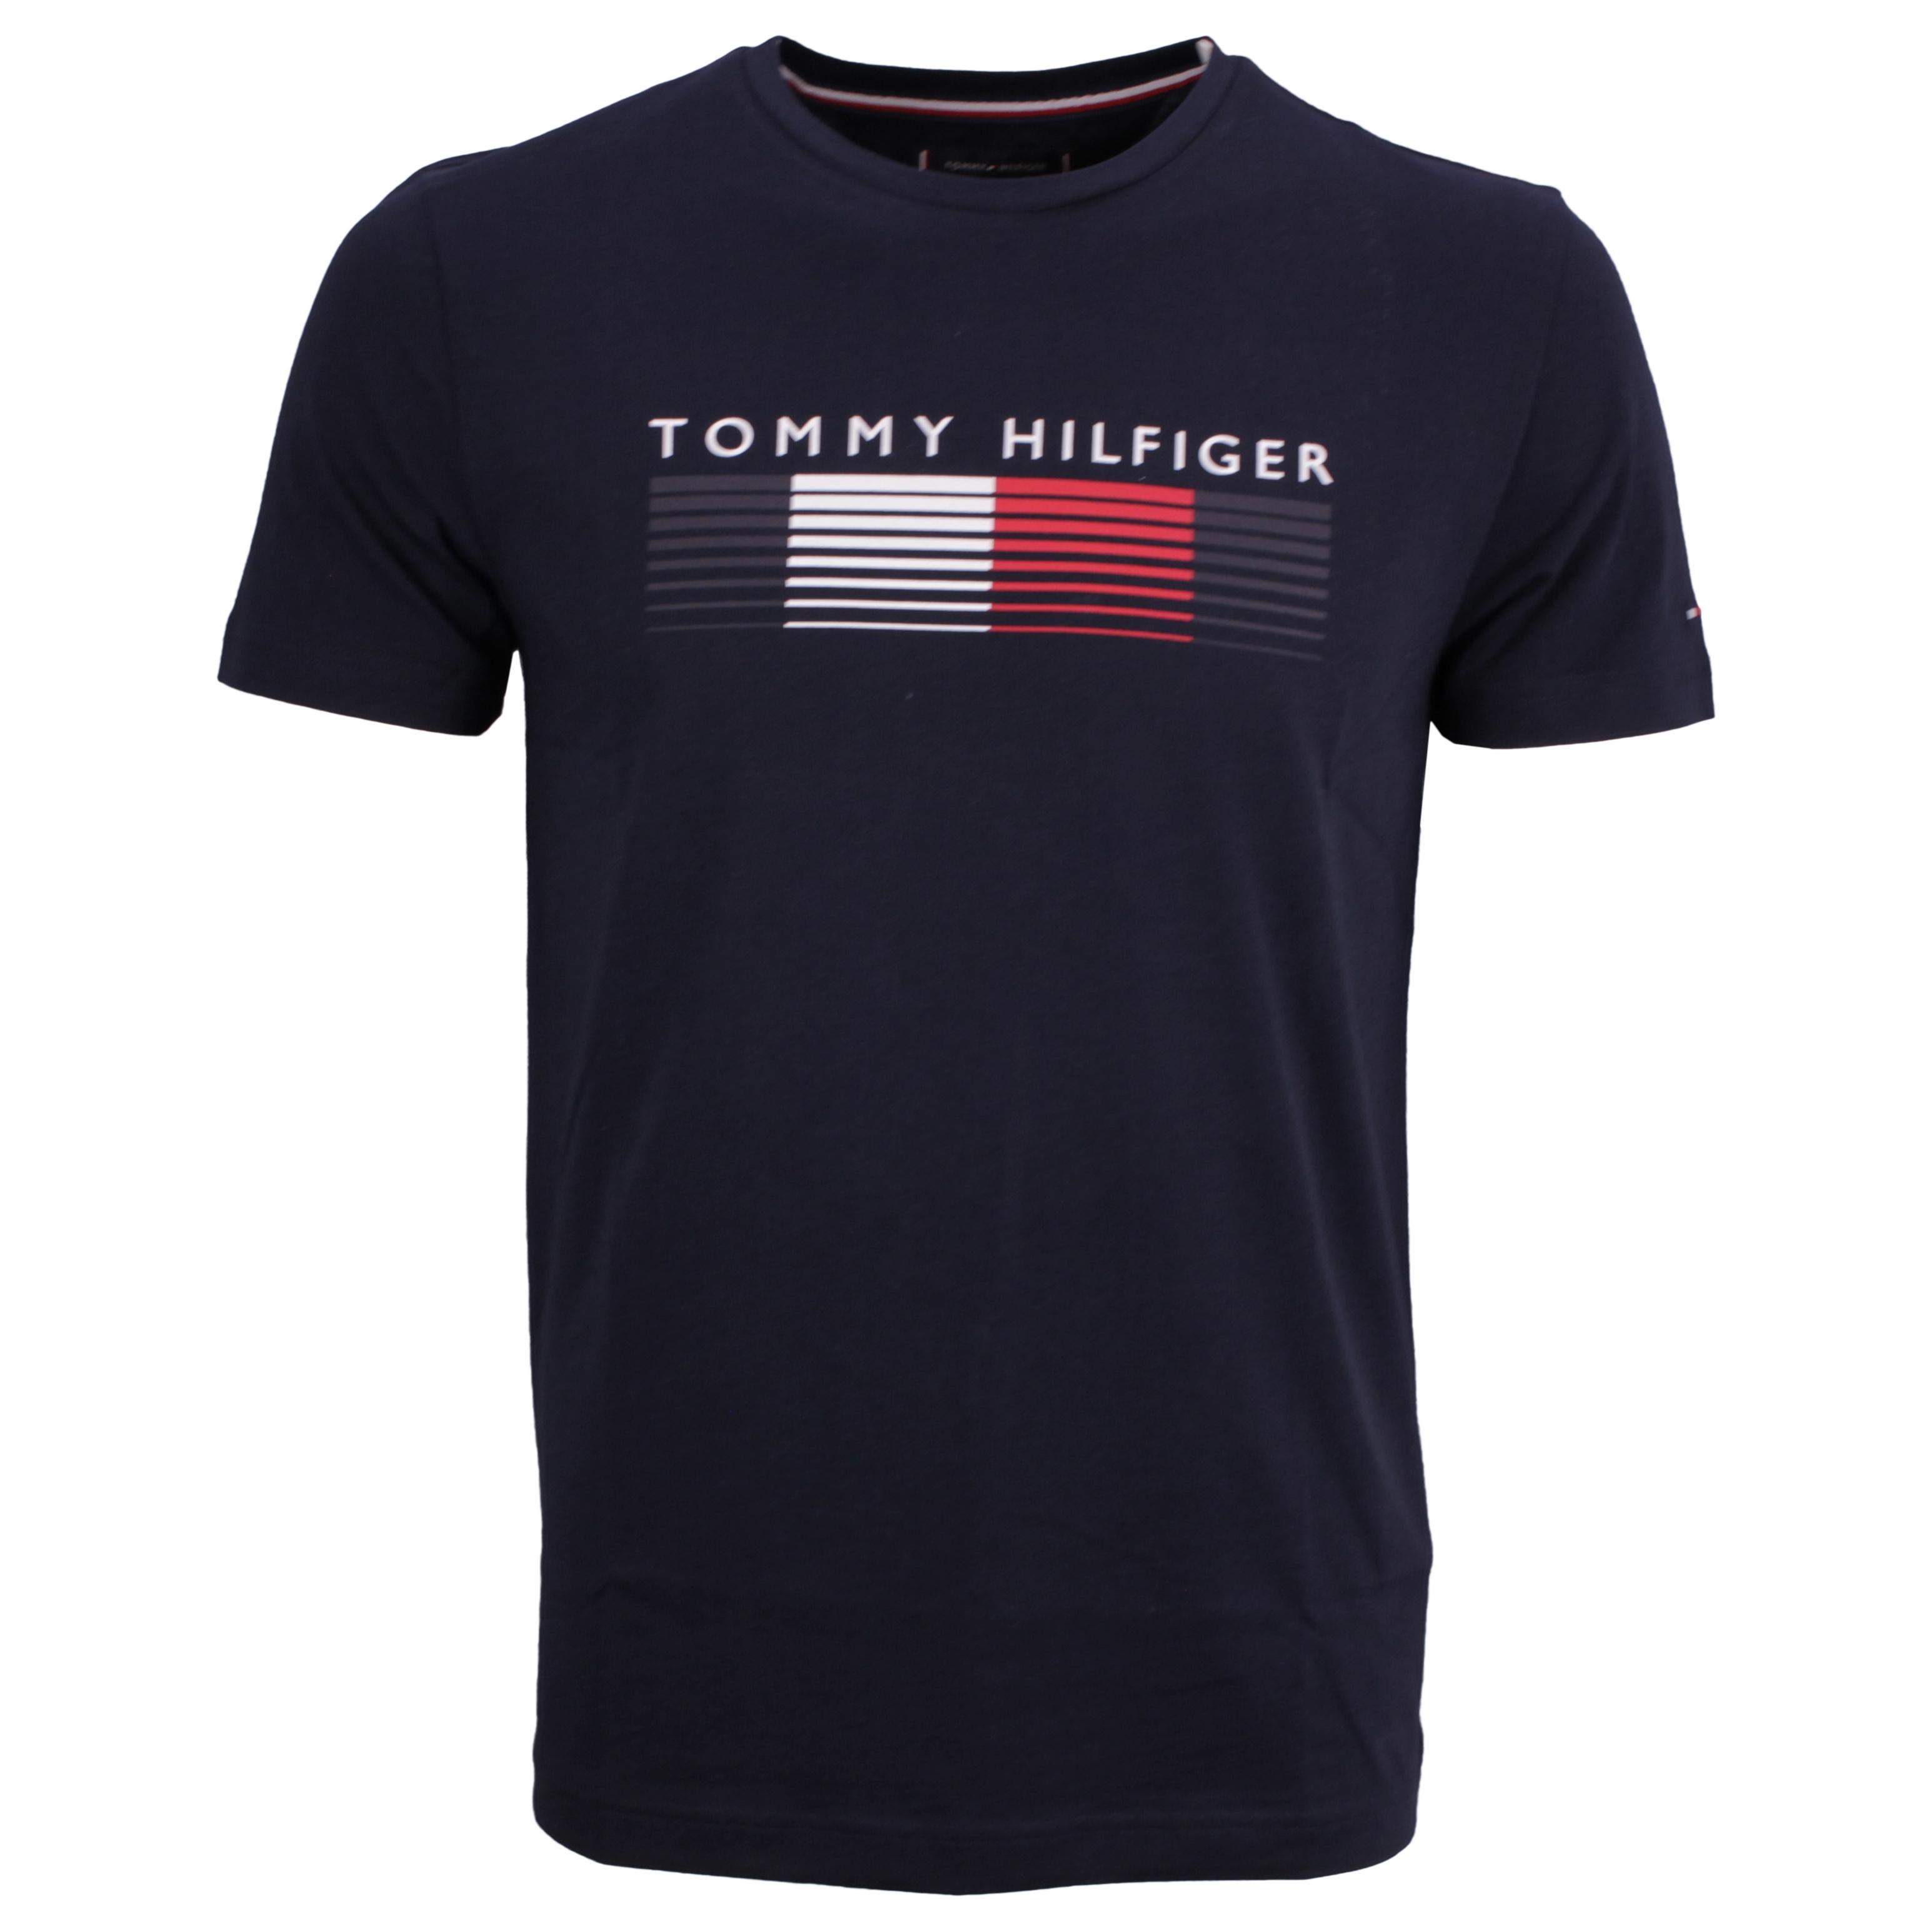 Tommy Hilfiger T-Shirt Shirt kurzarm Fade Graphic Corp Tee blau MW0MW21008 DW5-blue